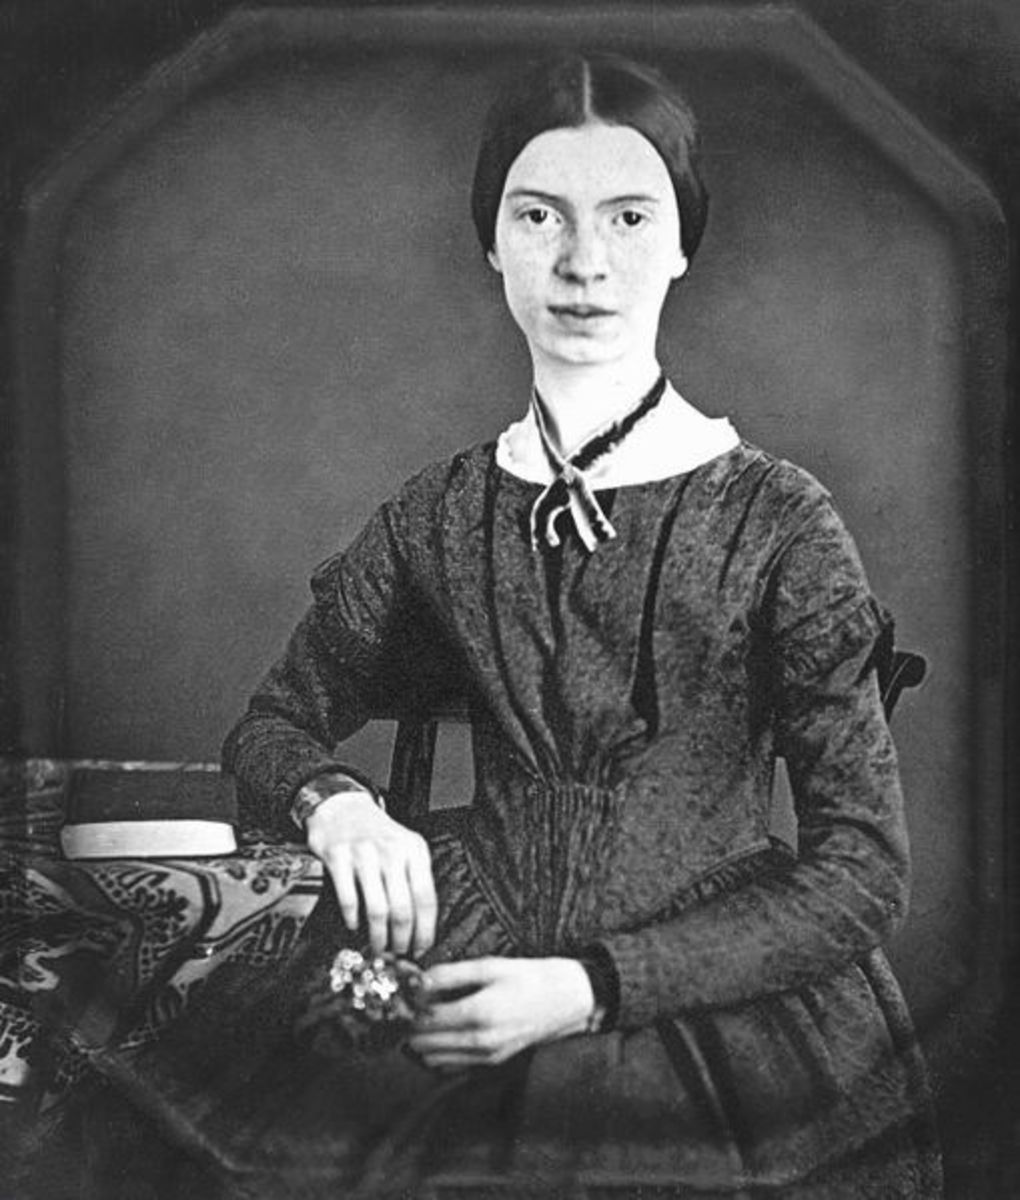 Daguerrotype of Dickinson circa age 17